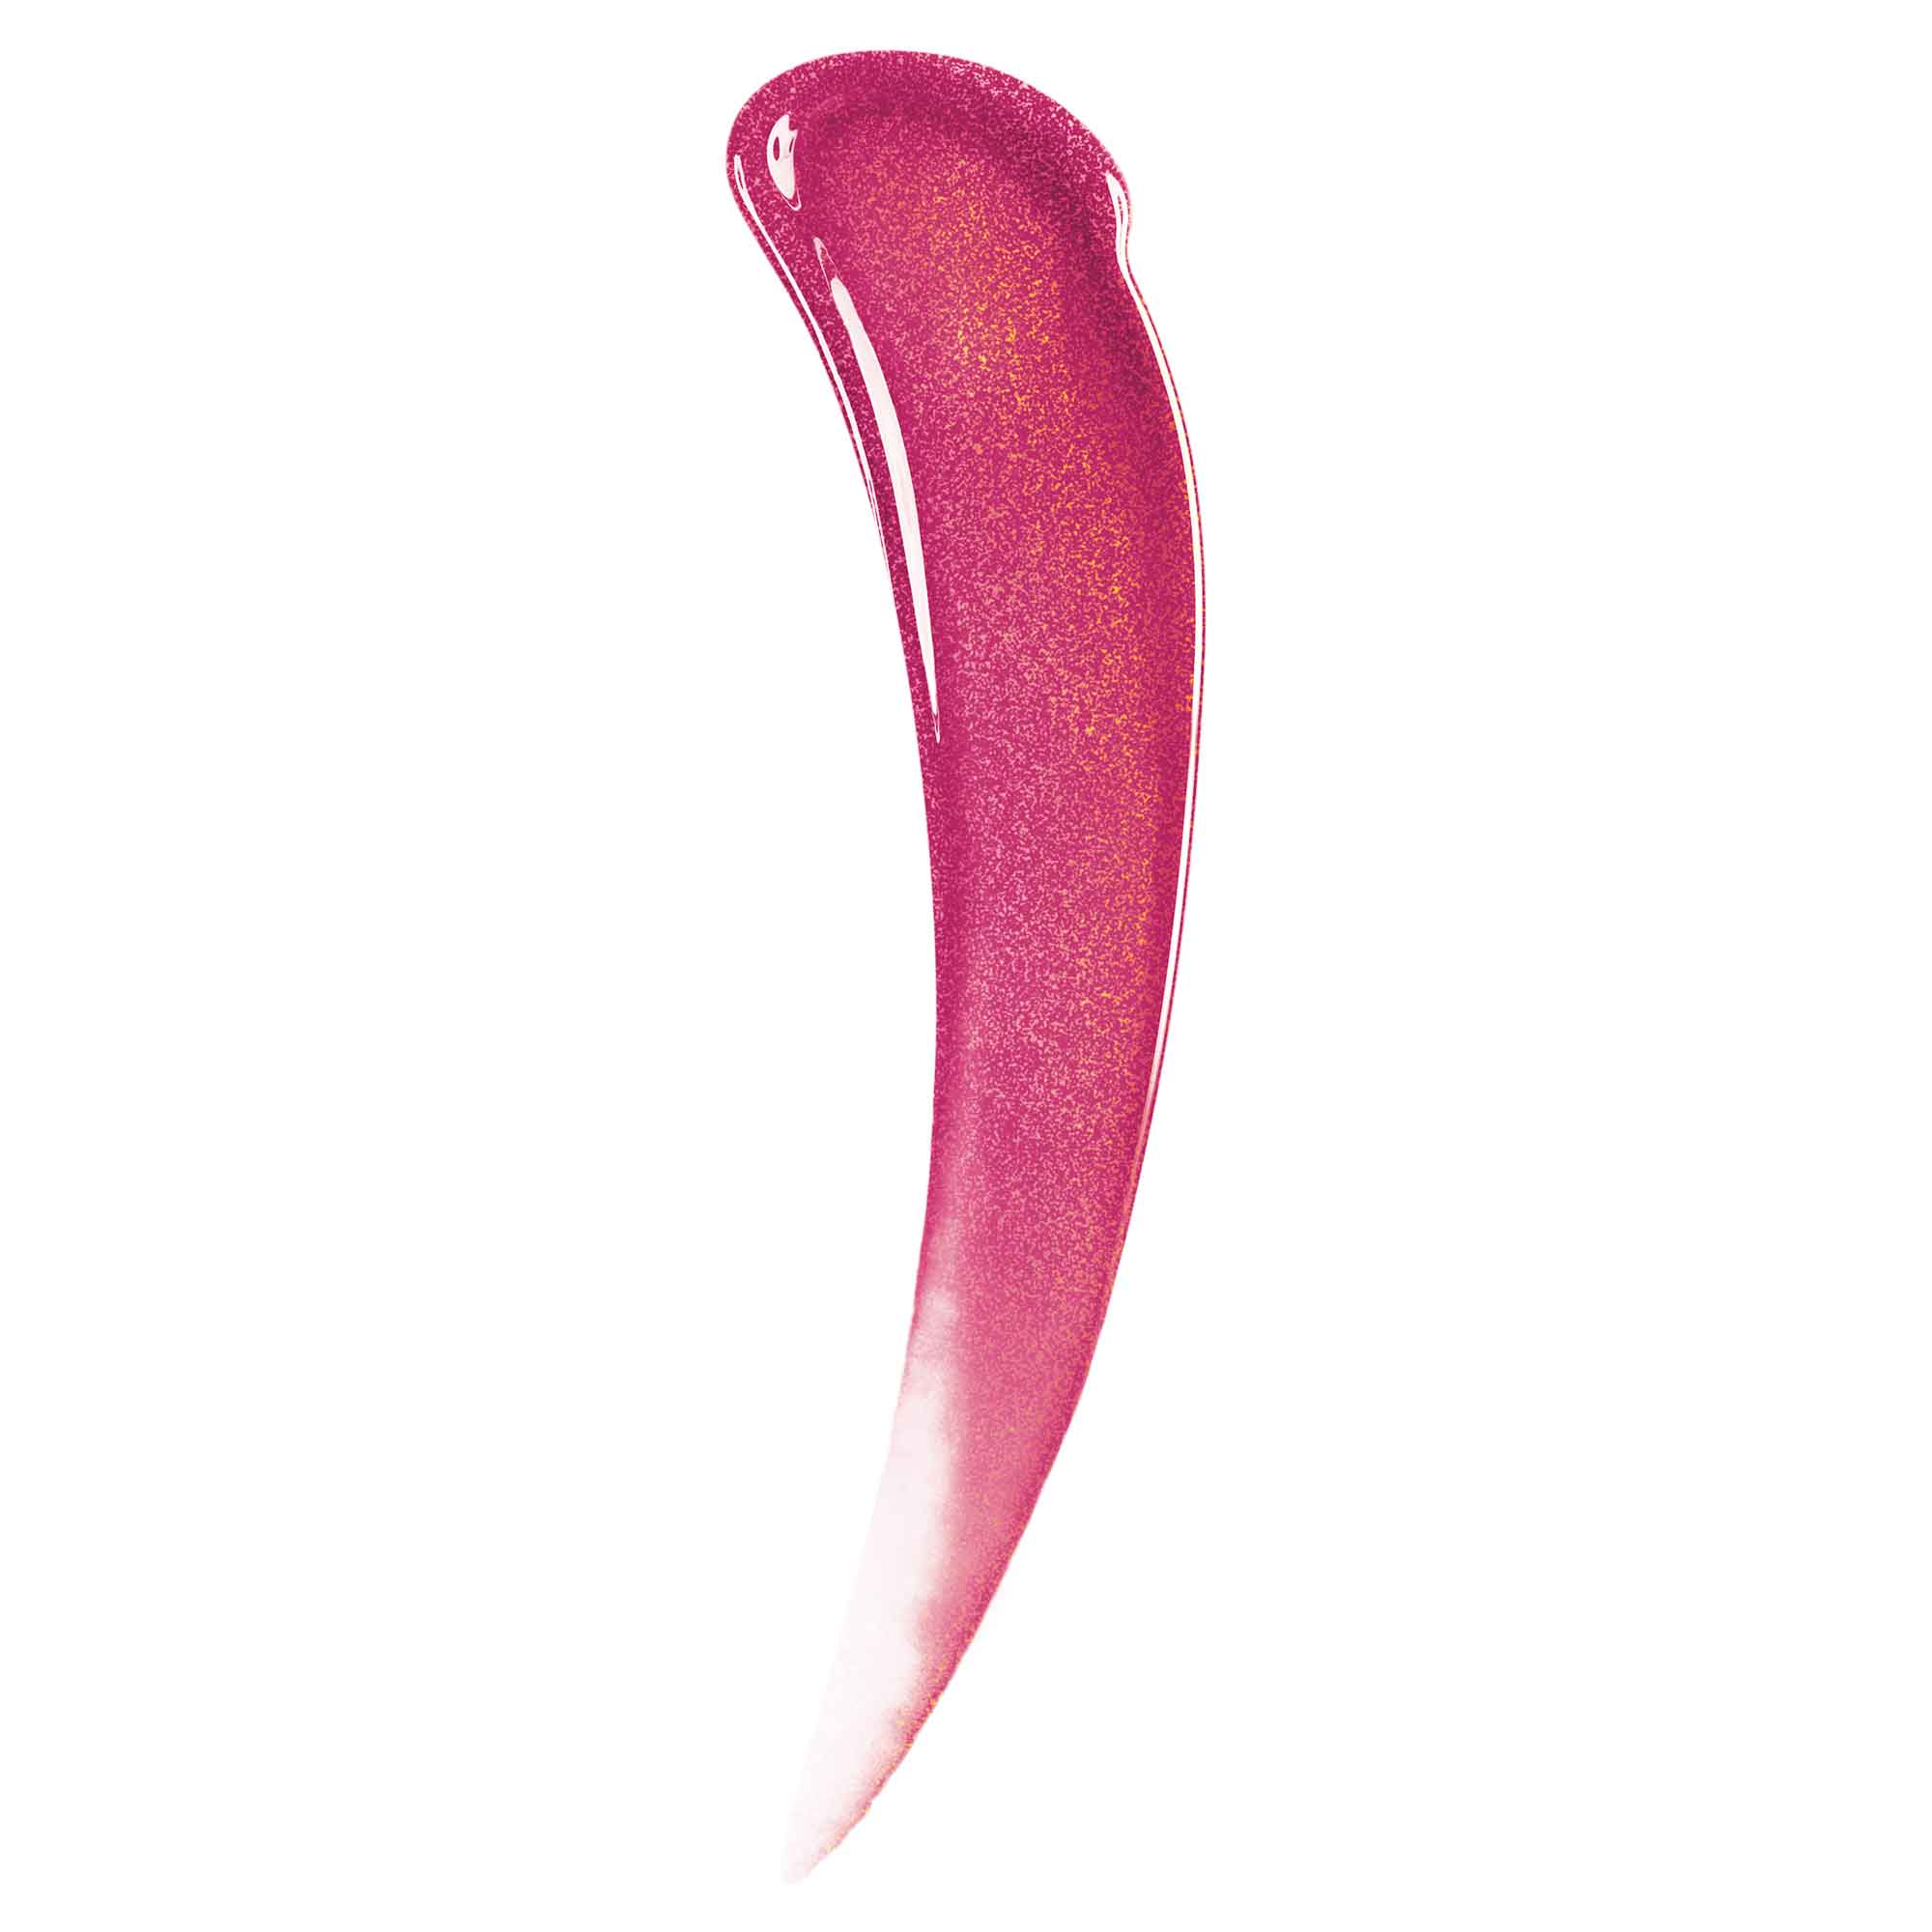 Gloss Angeles Lip Gloss by Smashbox #21